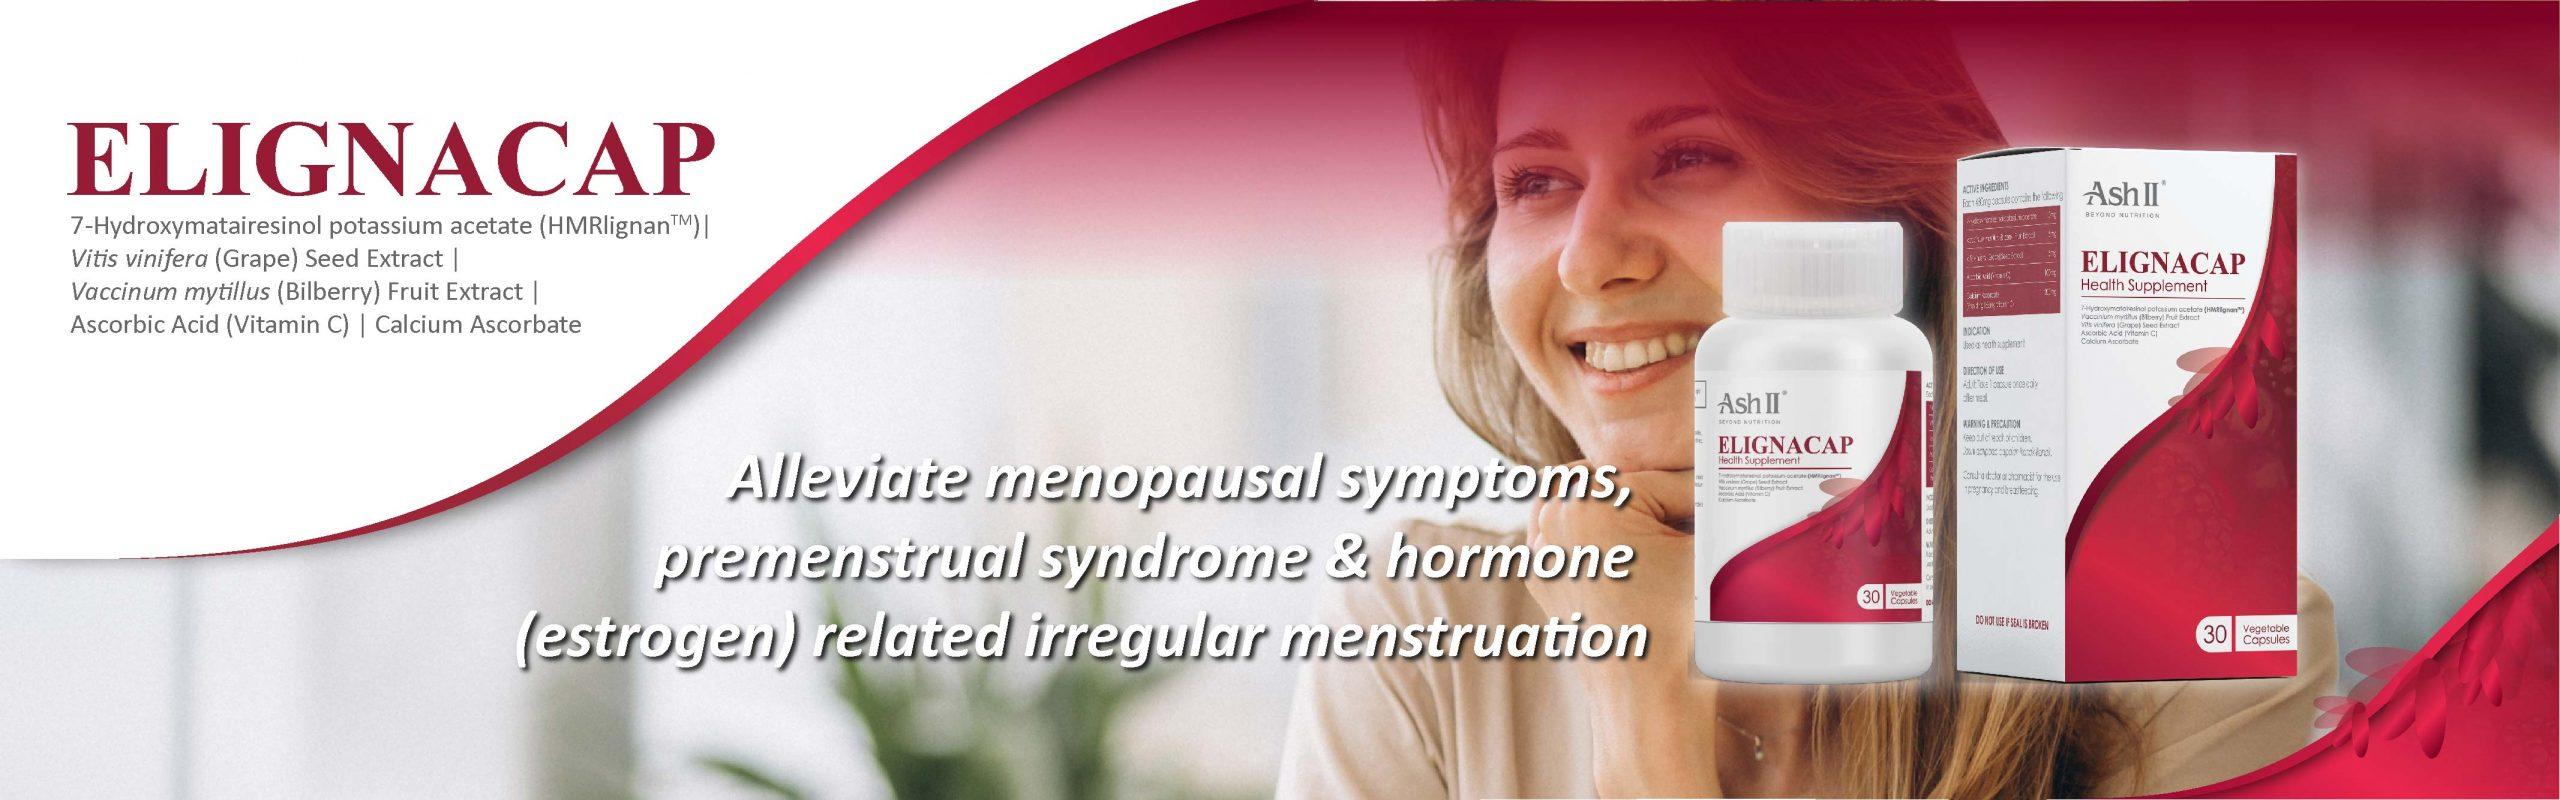 ELIGNACAP - Alleviate menopausal symptoms, premenstrual syndrome, irregular menstruation